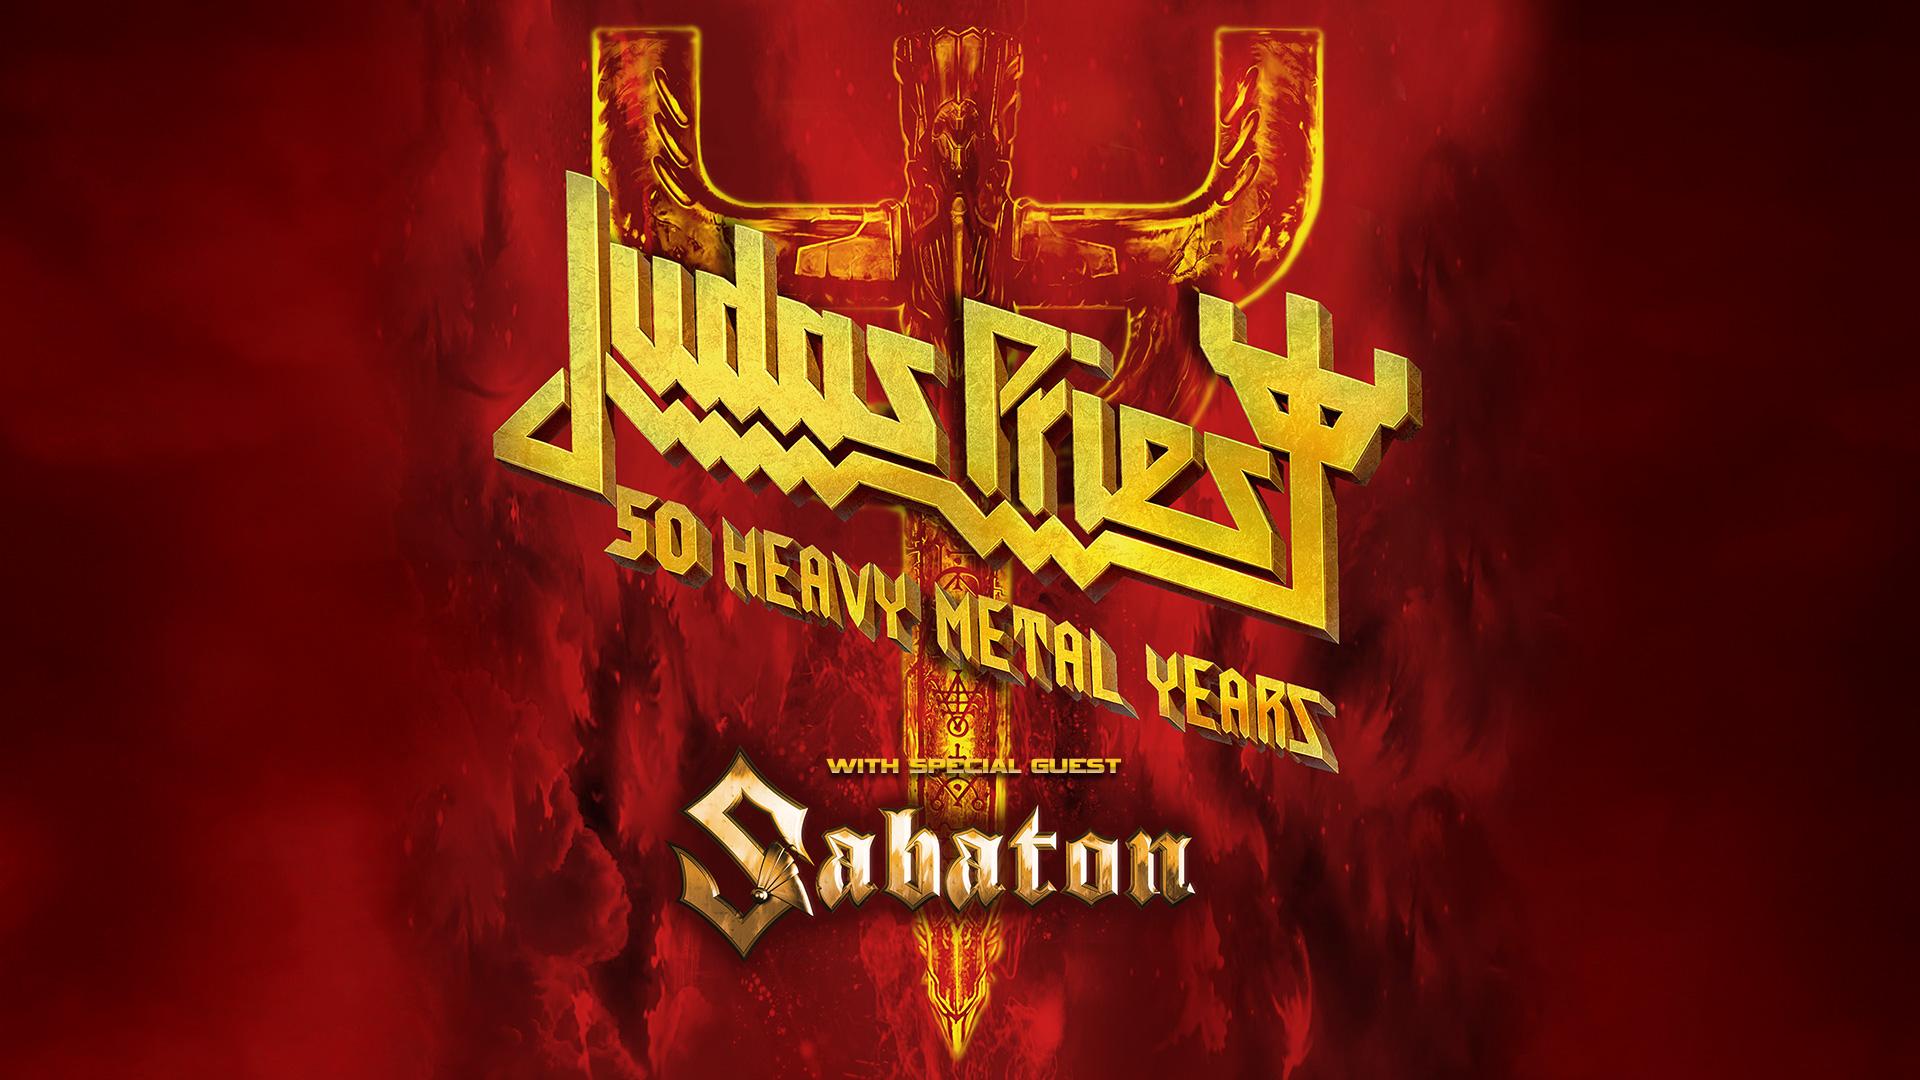 Judas Priest: 50 Heavy Metal Years @Red Hat Amphitheater, Raleigh